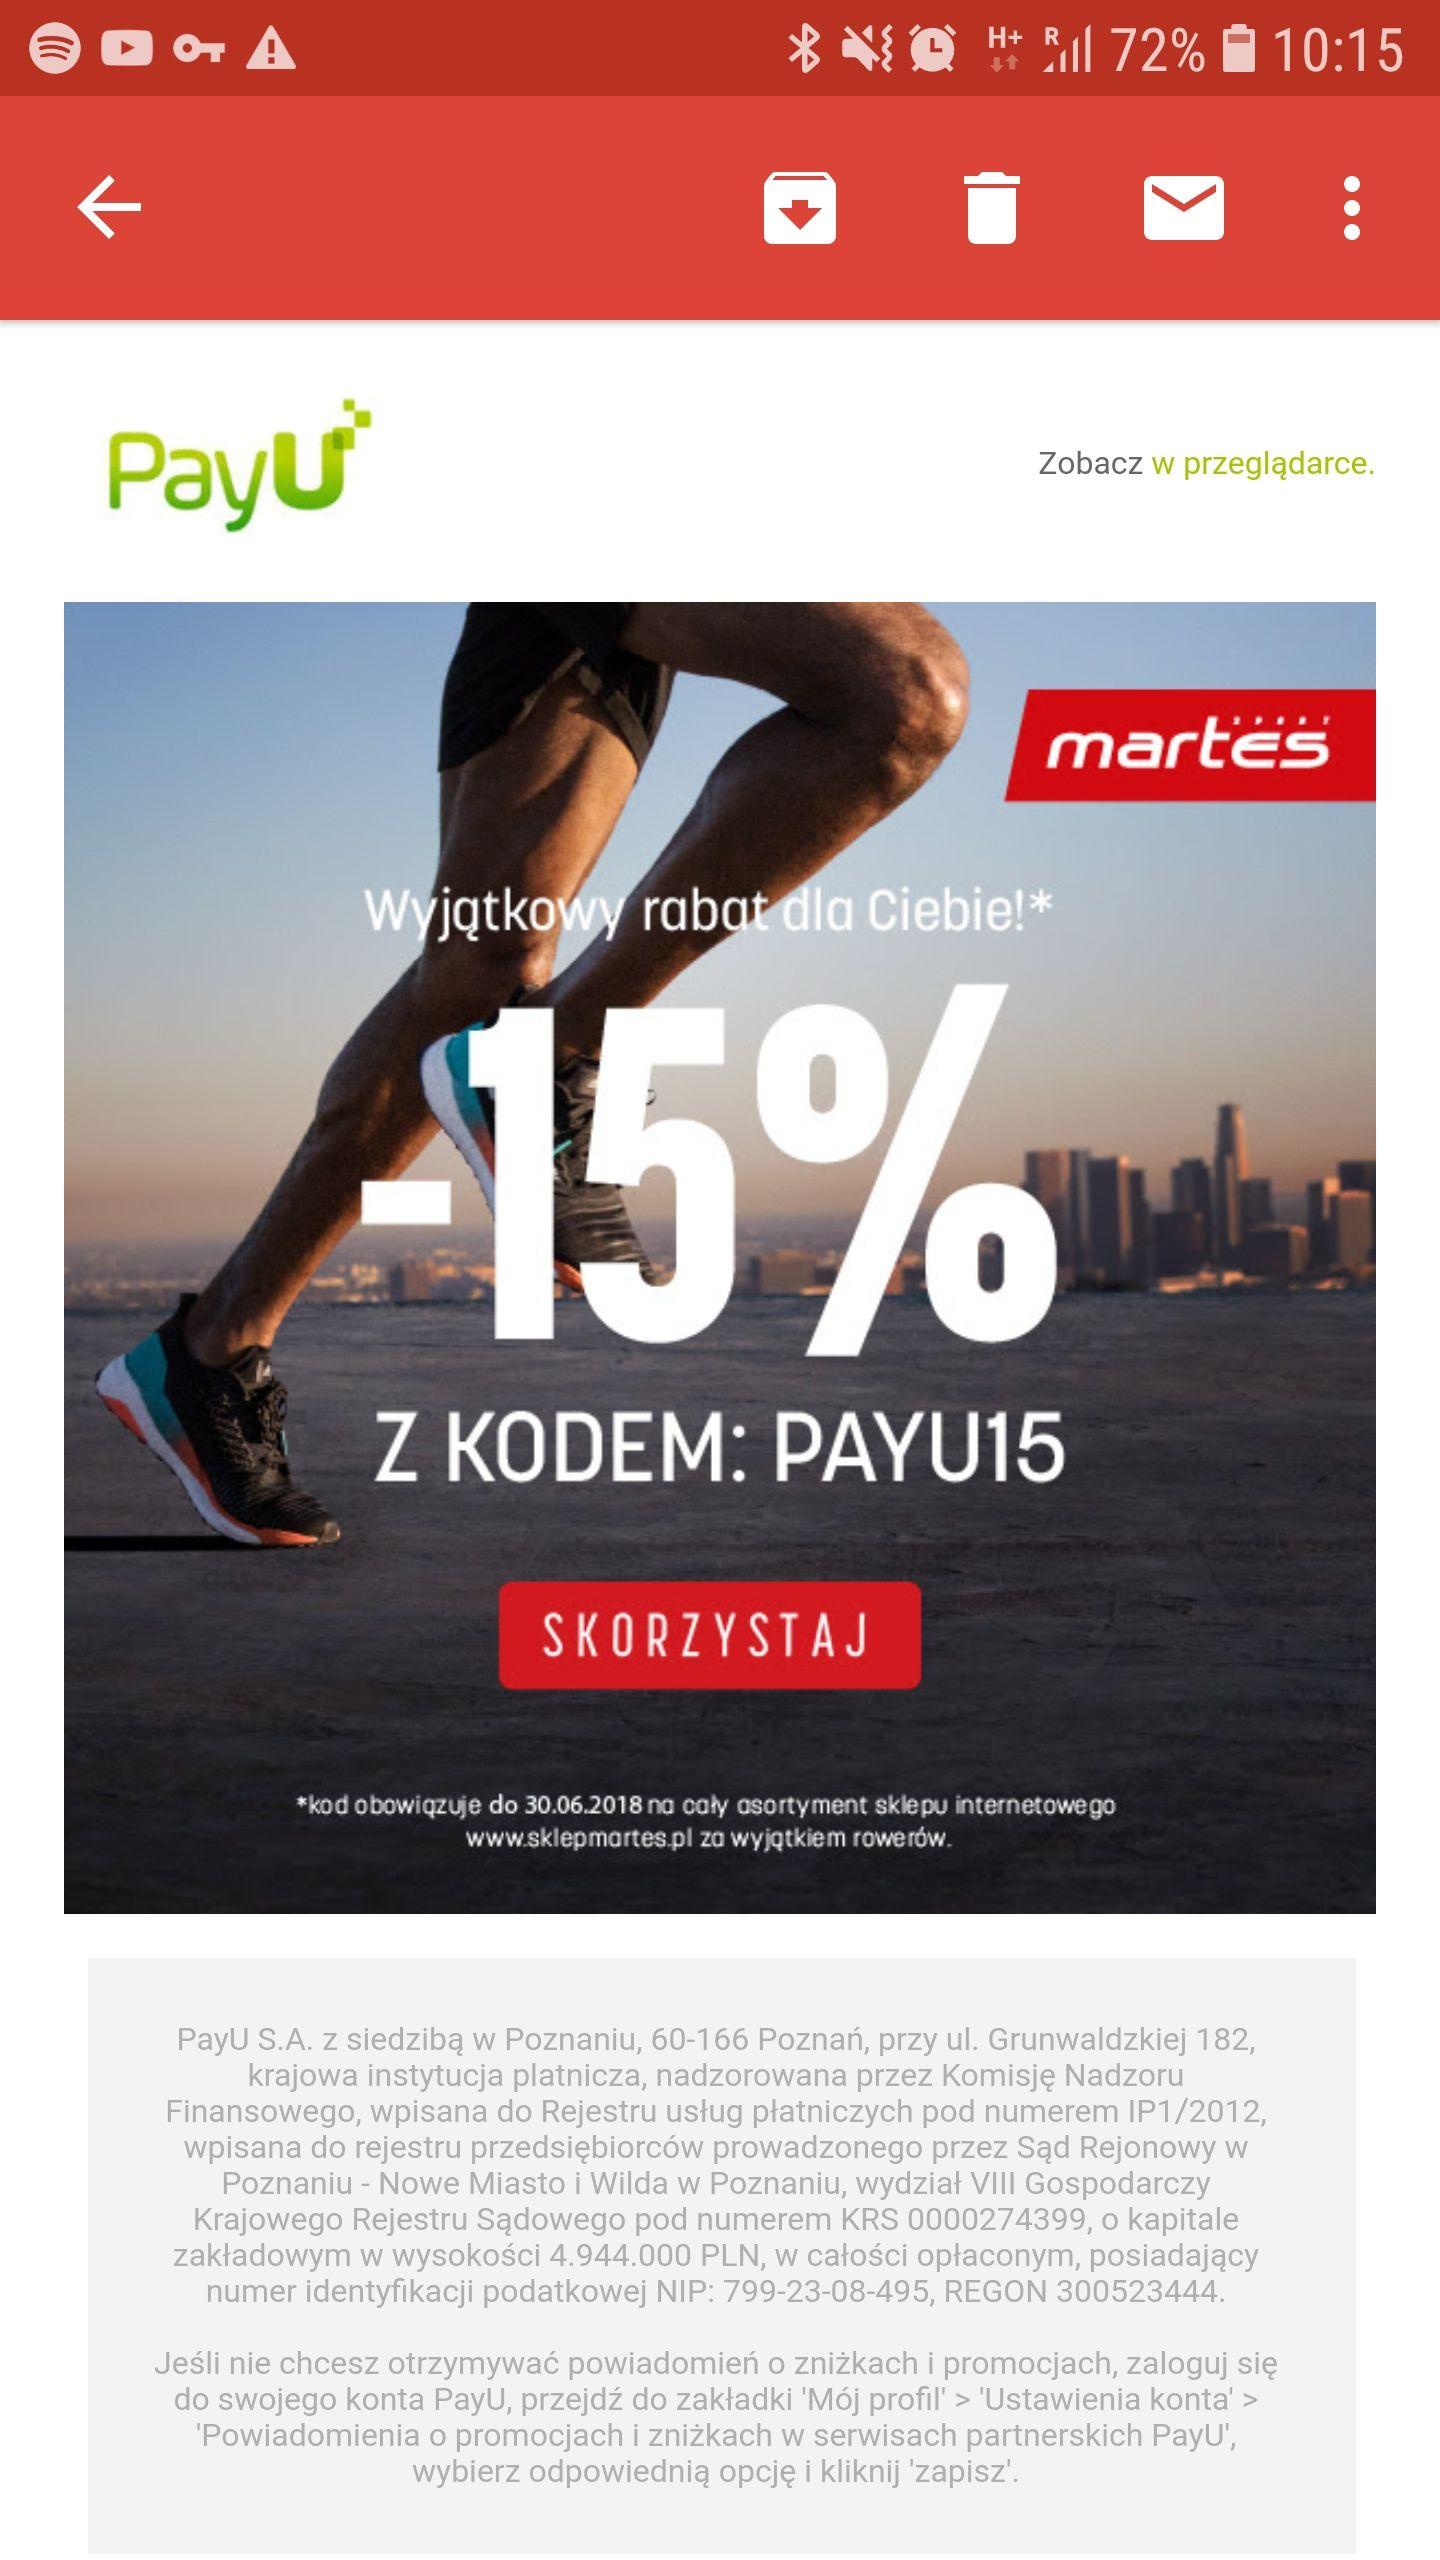 Rabat 15% w Martes od PayU